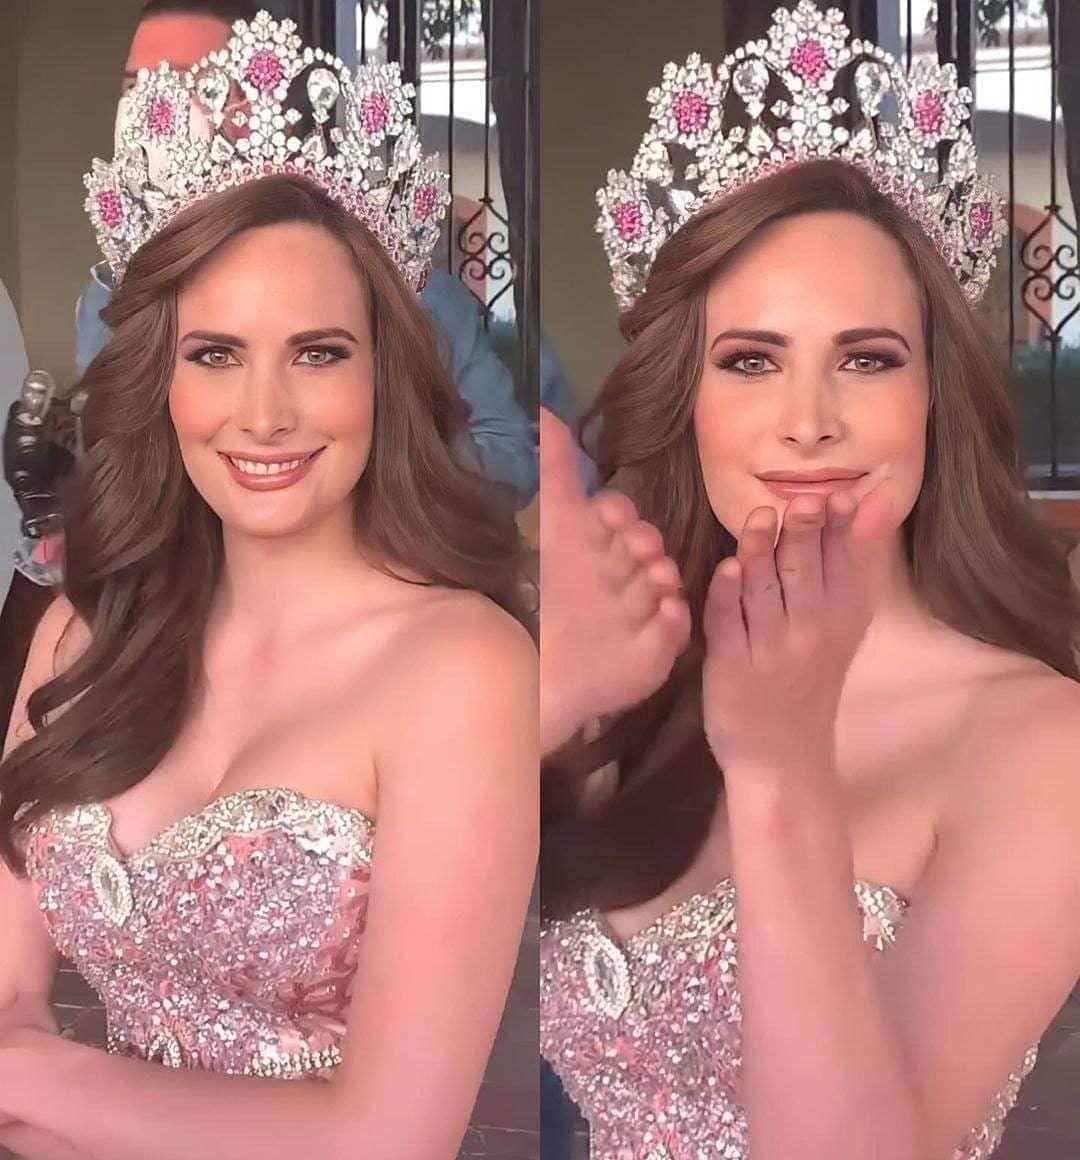 new corona de mexicana universal. Mundo-dmisses-127209543-219366299600820-5706694746263069589-n